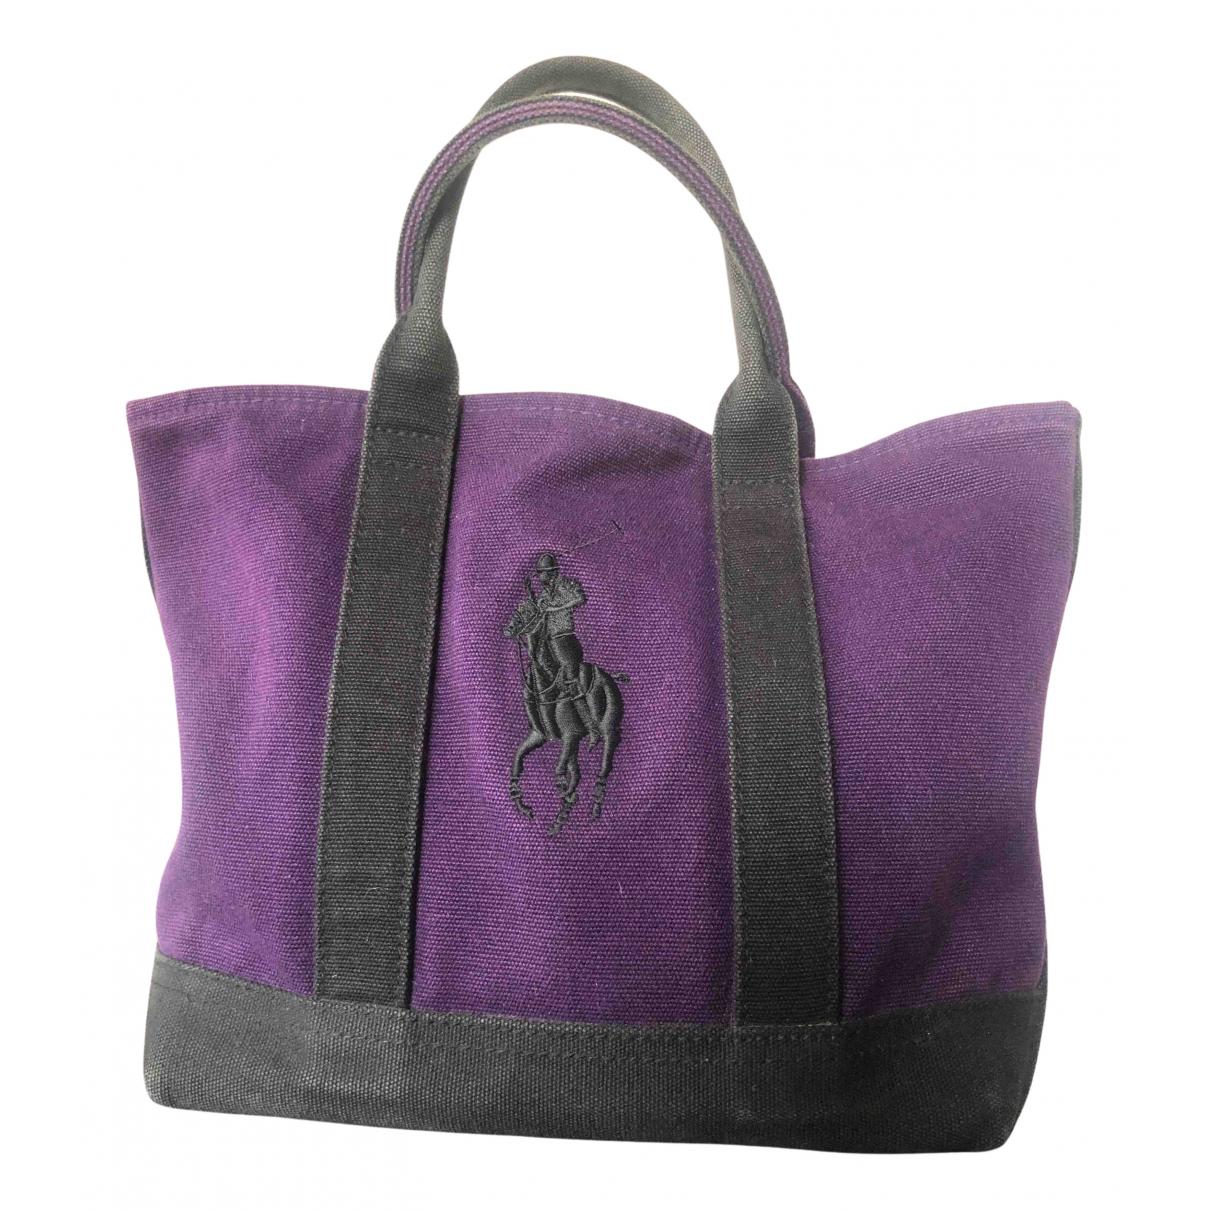 Polo Ralph Lauren N Purple Cloth handbag for Women N